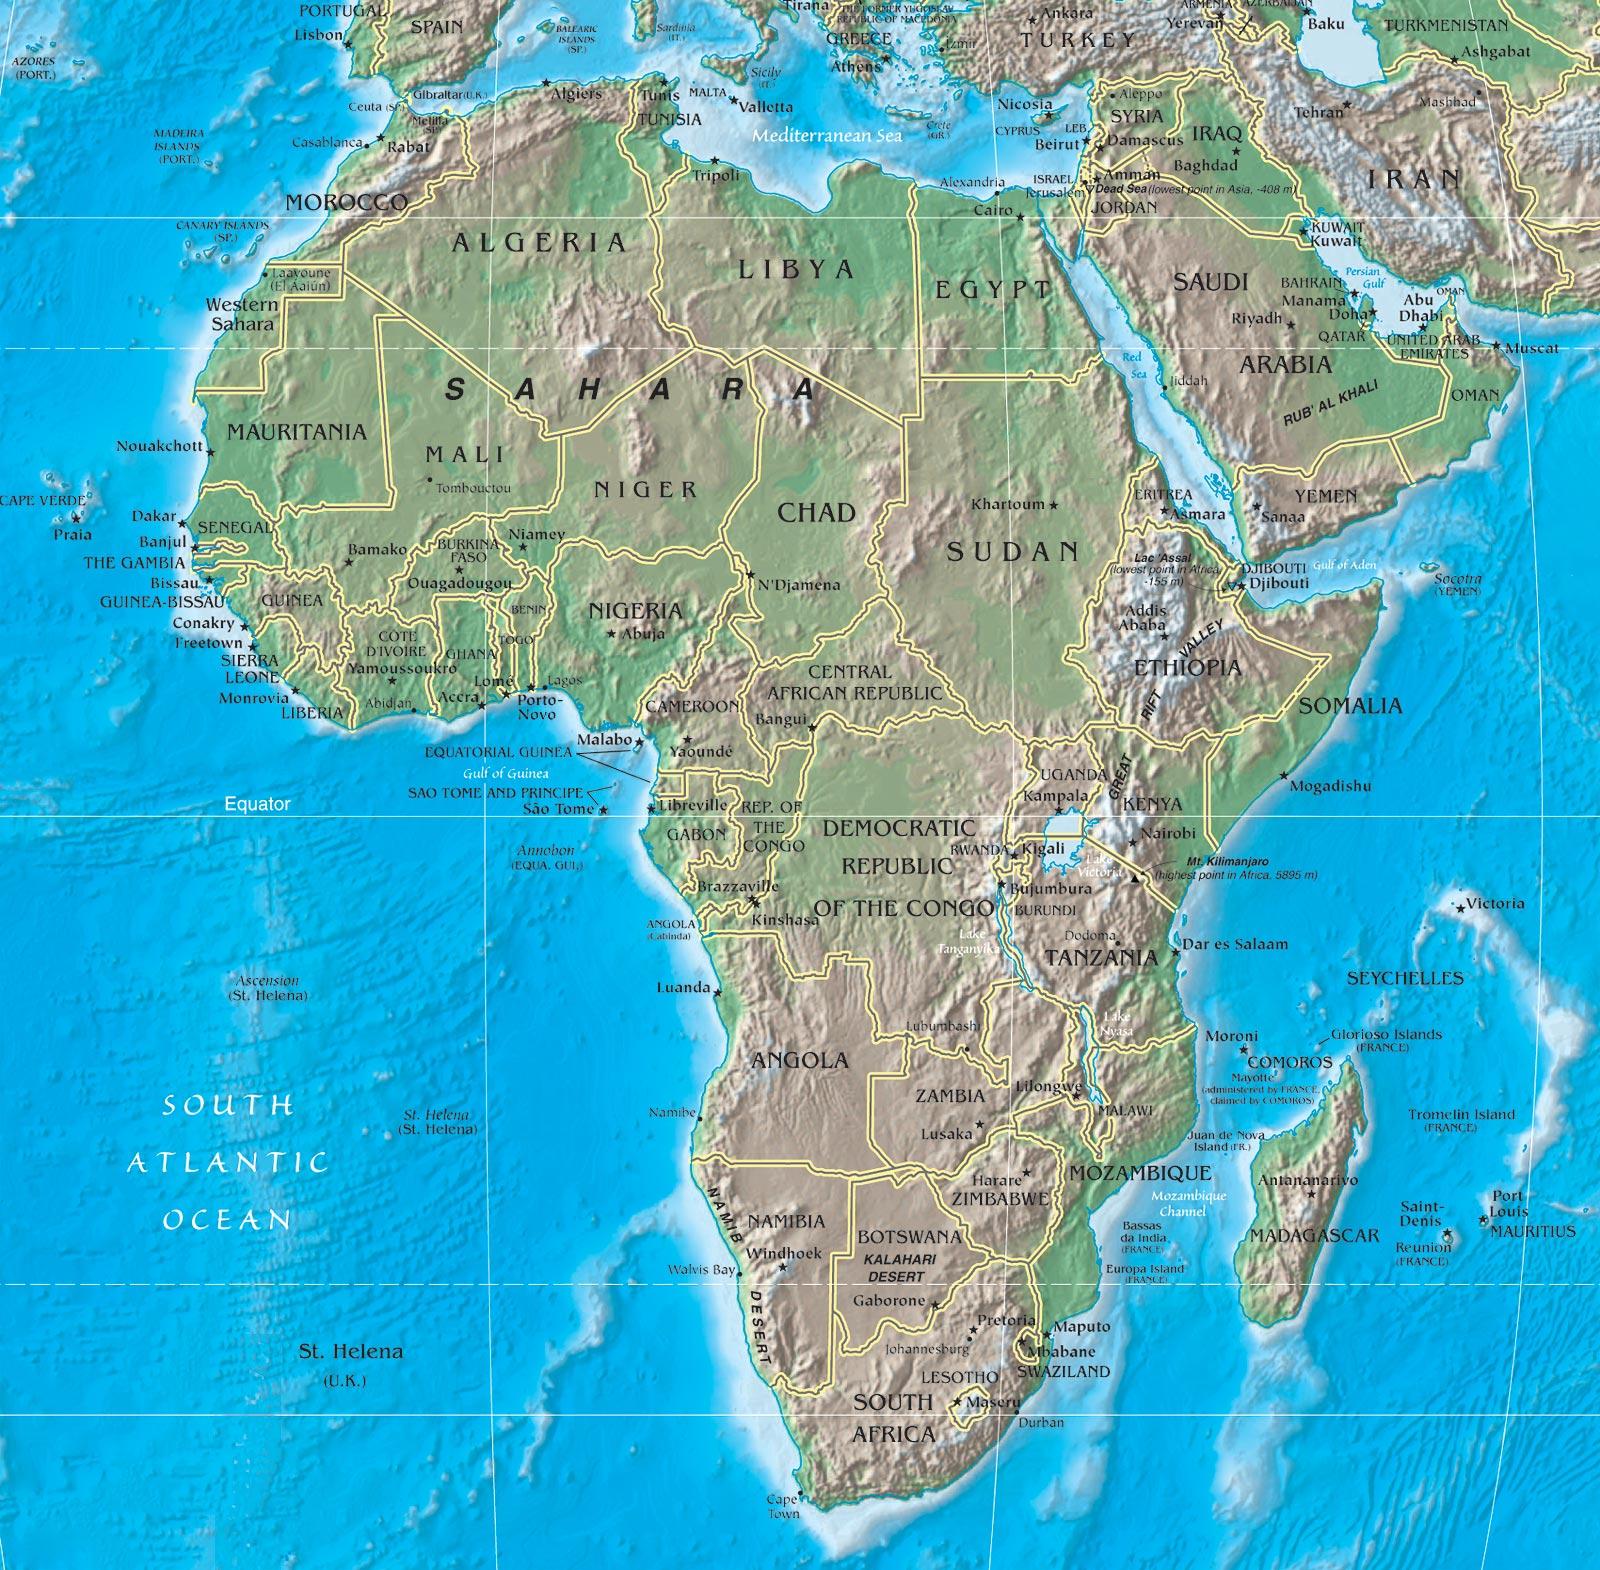 L Africa Cartina Geografica.Mappa Dell Africa Geografica Carta Geografica Del Continente